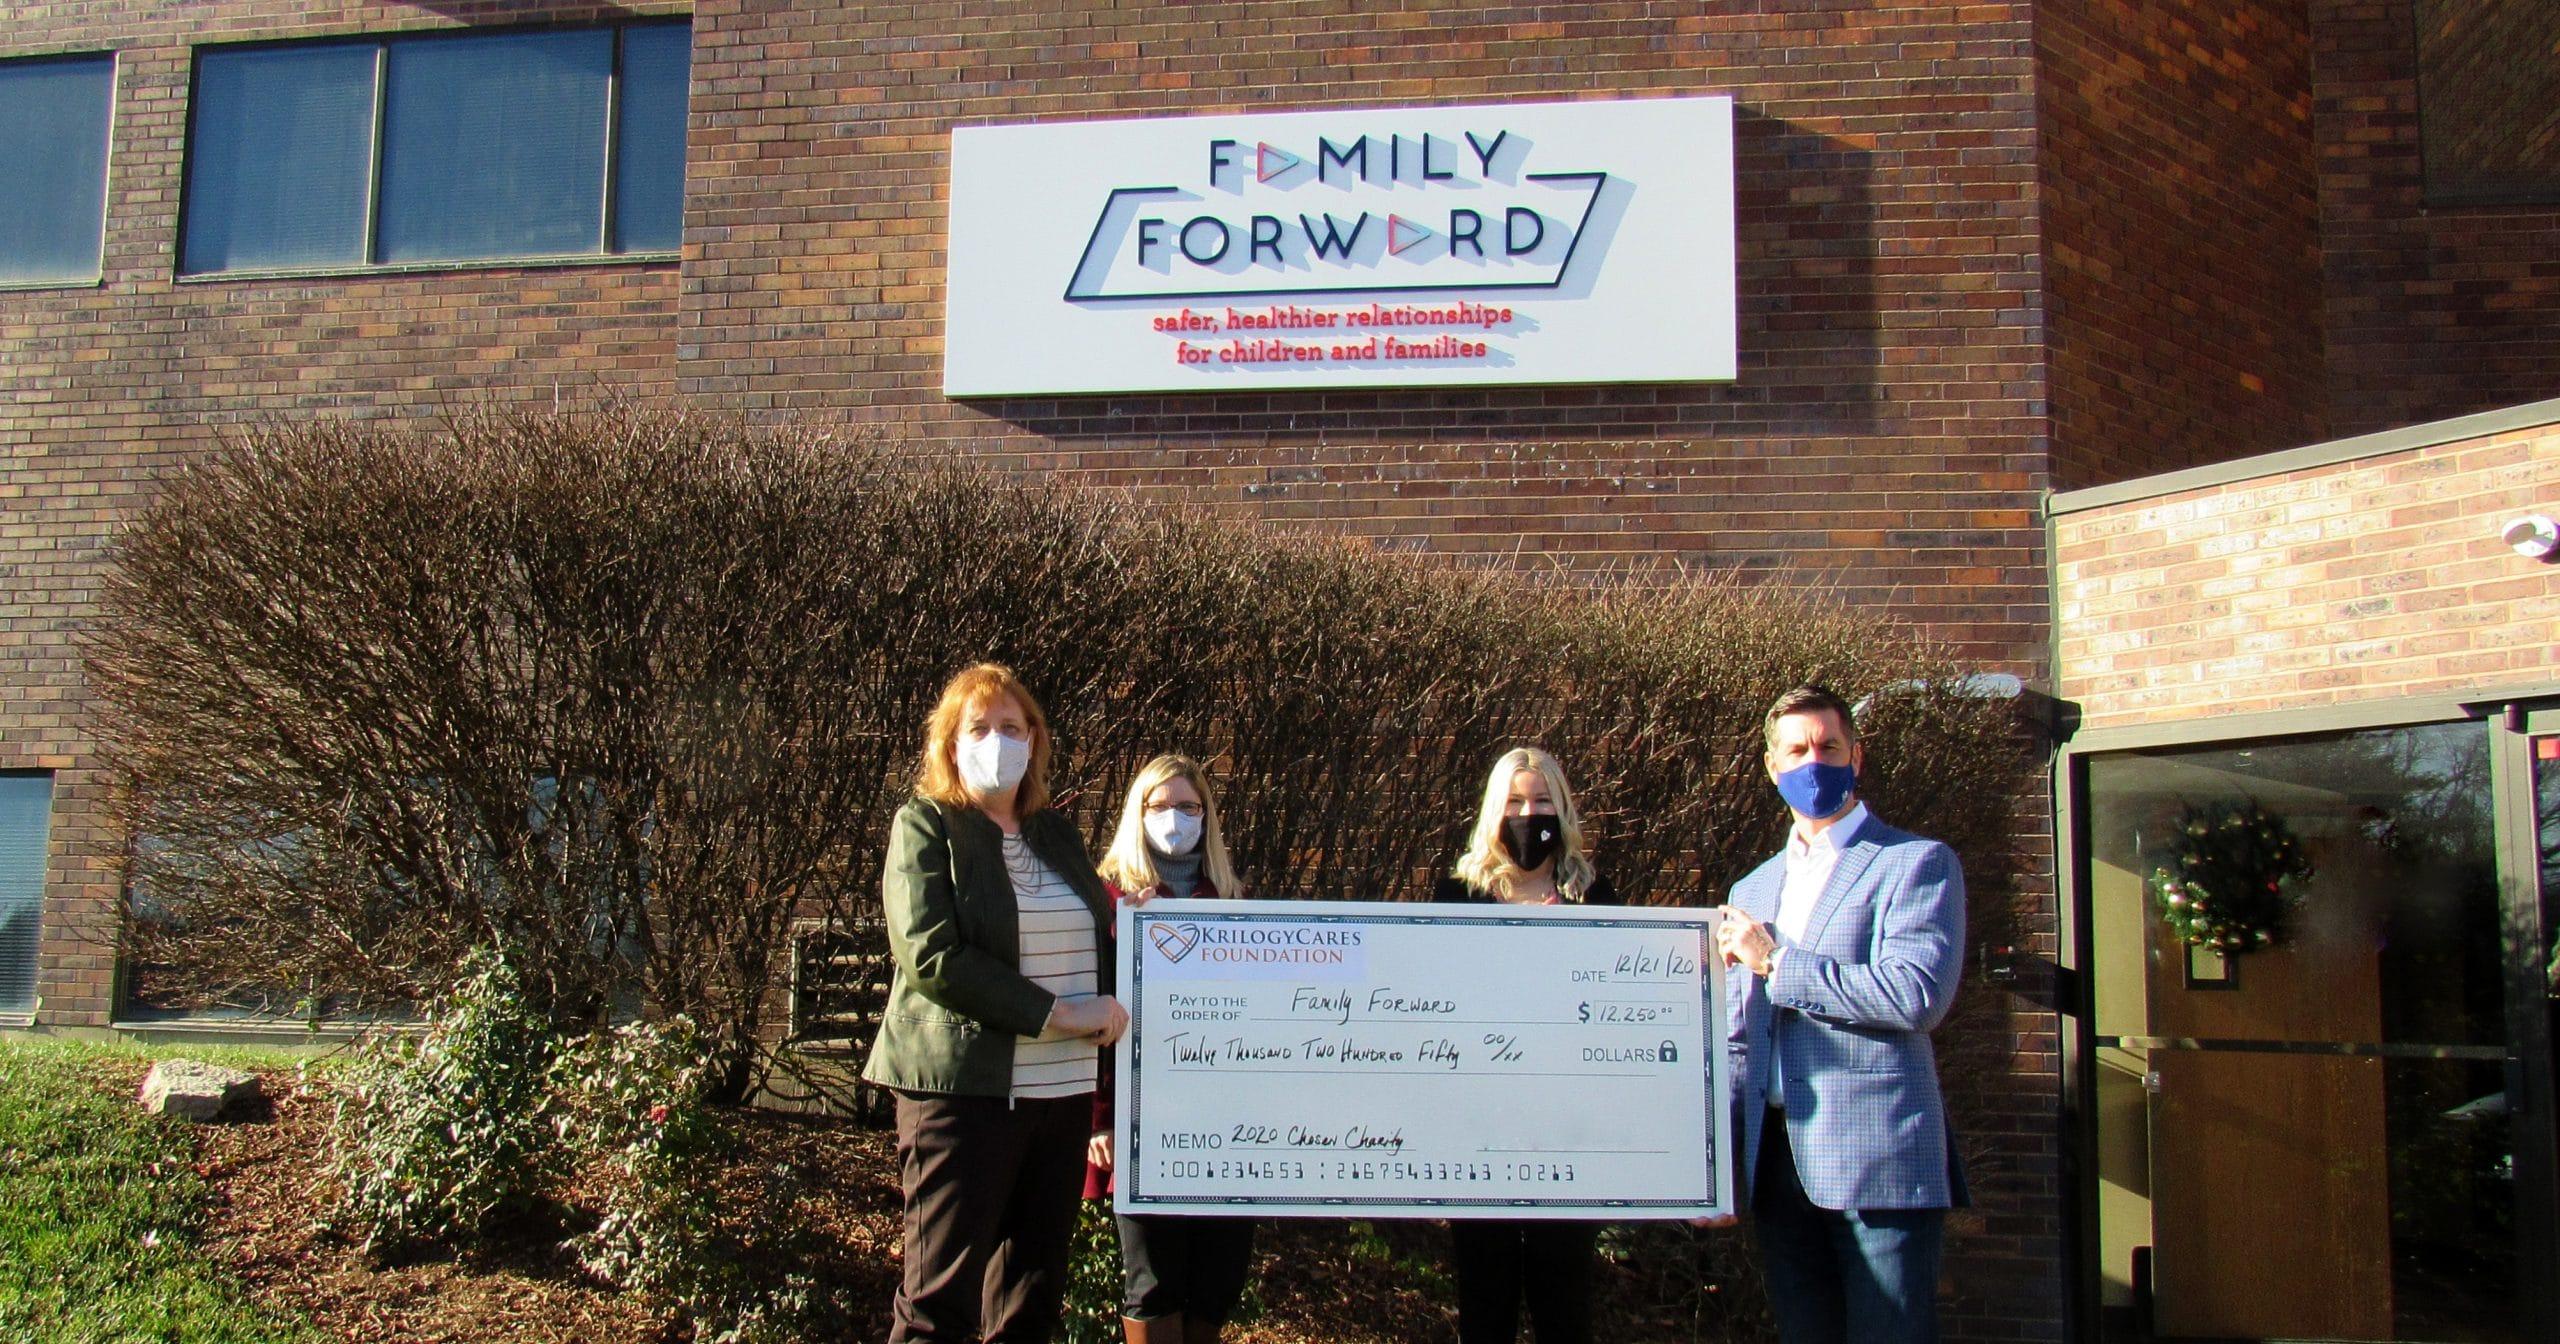 Krilogy presents check to FamilyForward, 2020 Krilogy Cares partner.